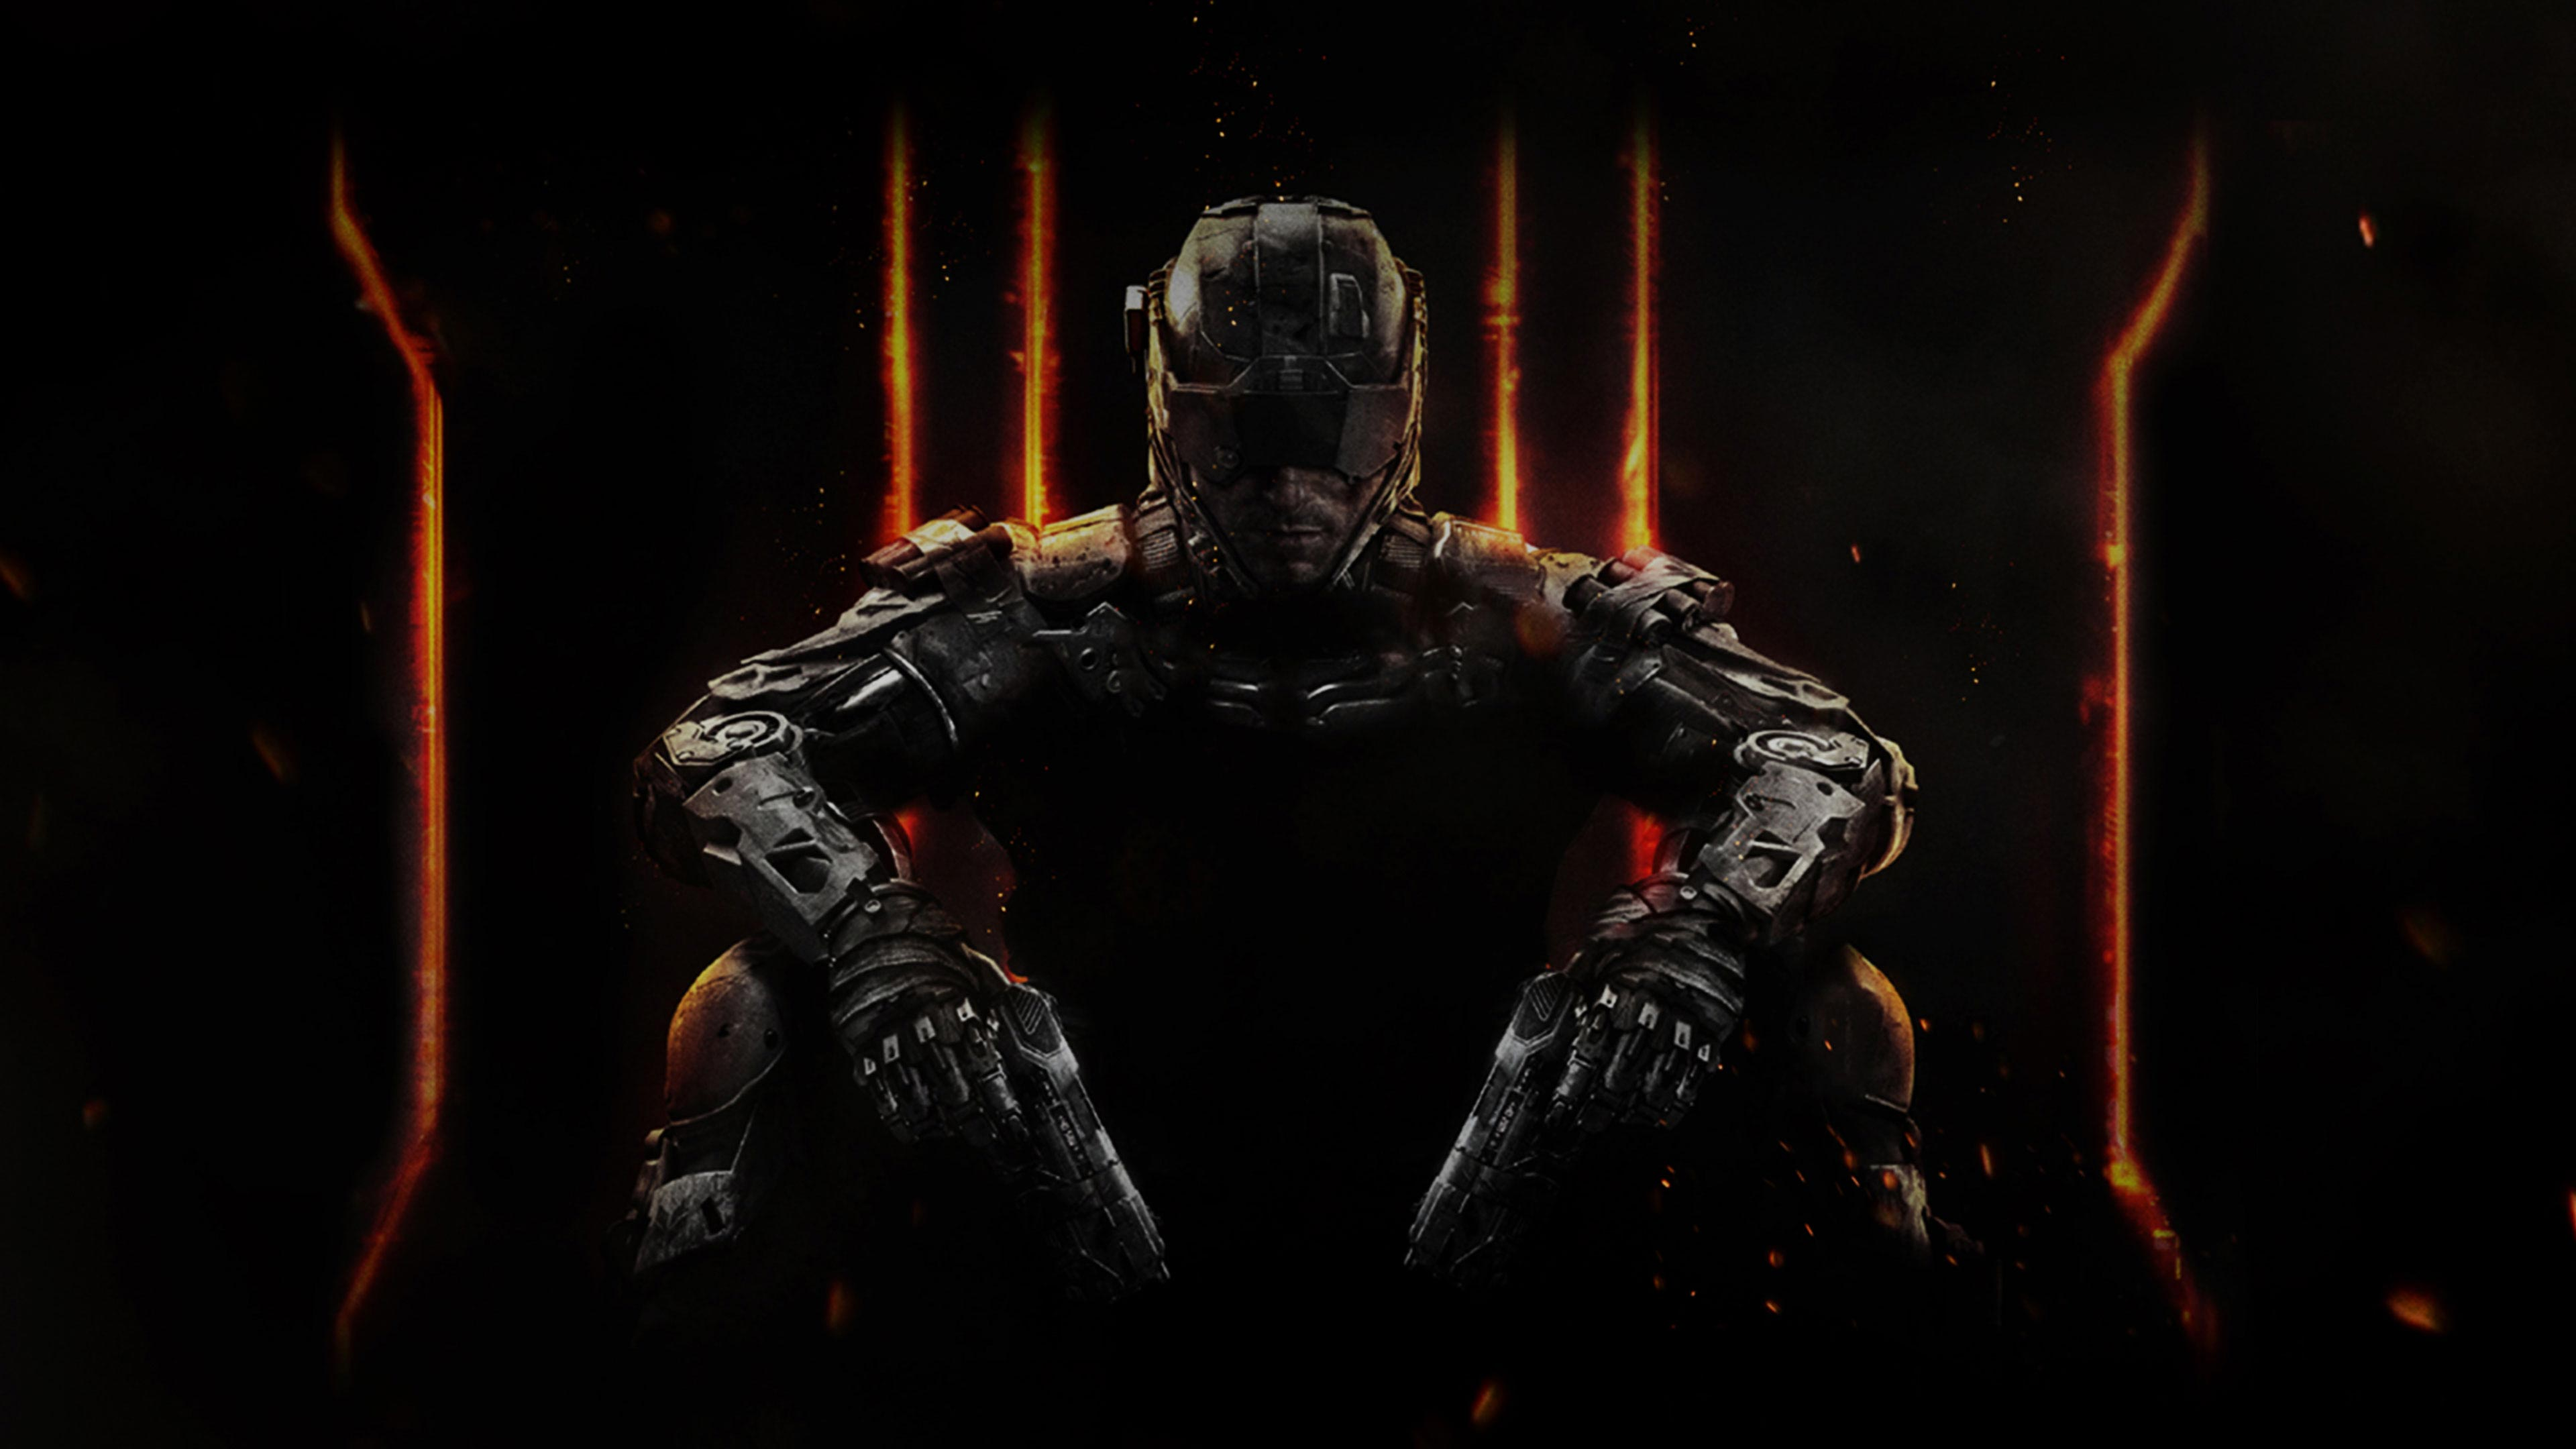 Cod Black Ops 3 Wallpaper: Call Of Duty Black Ops 3 Wallpaper 1